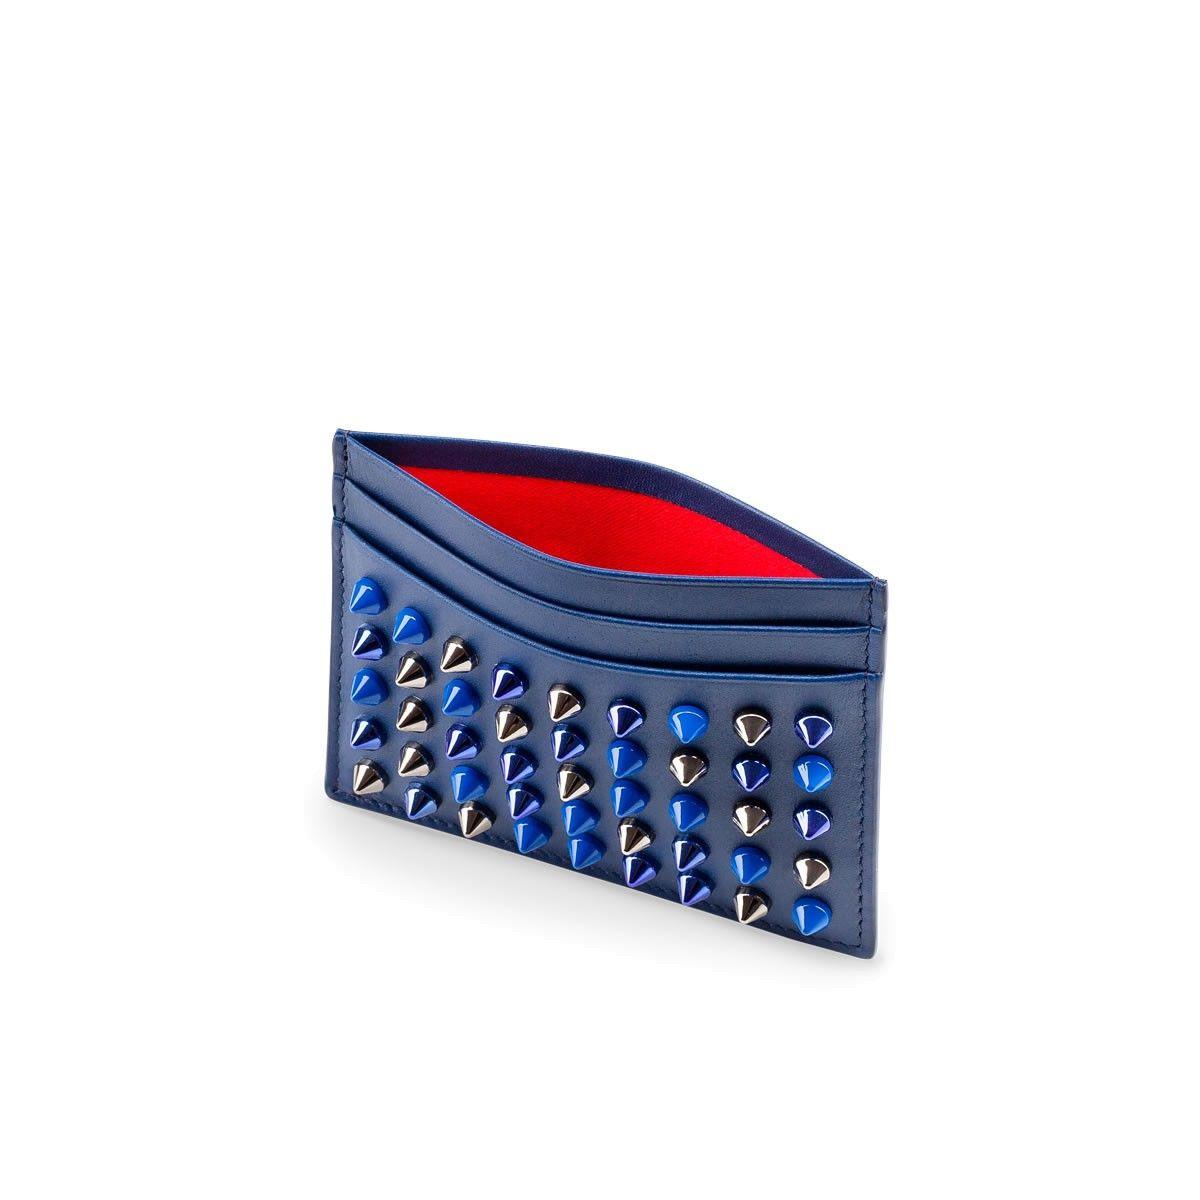 Kios Simple Card Holder Holder Espadon Calfskin